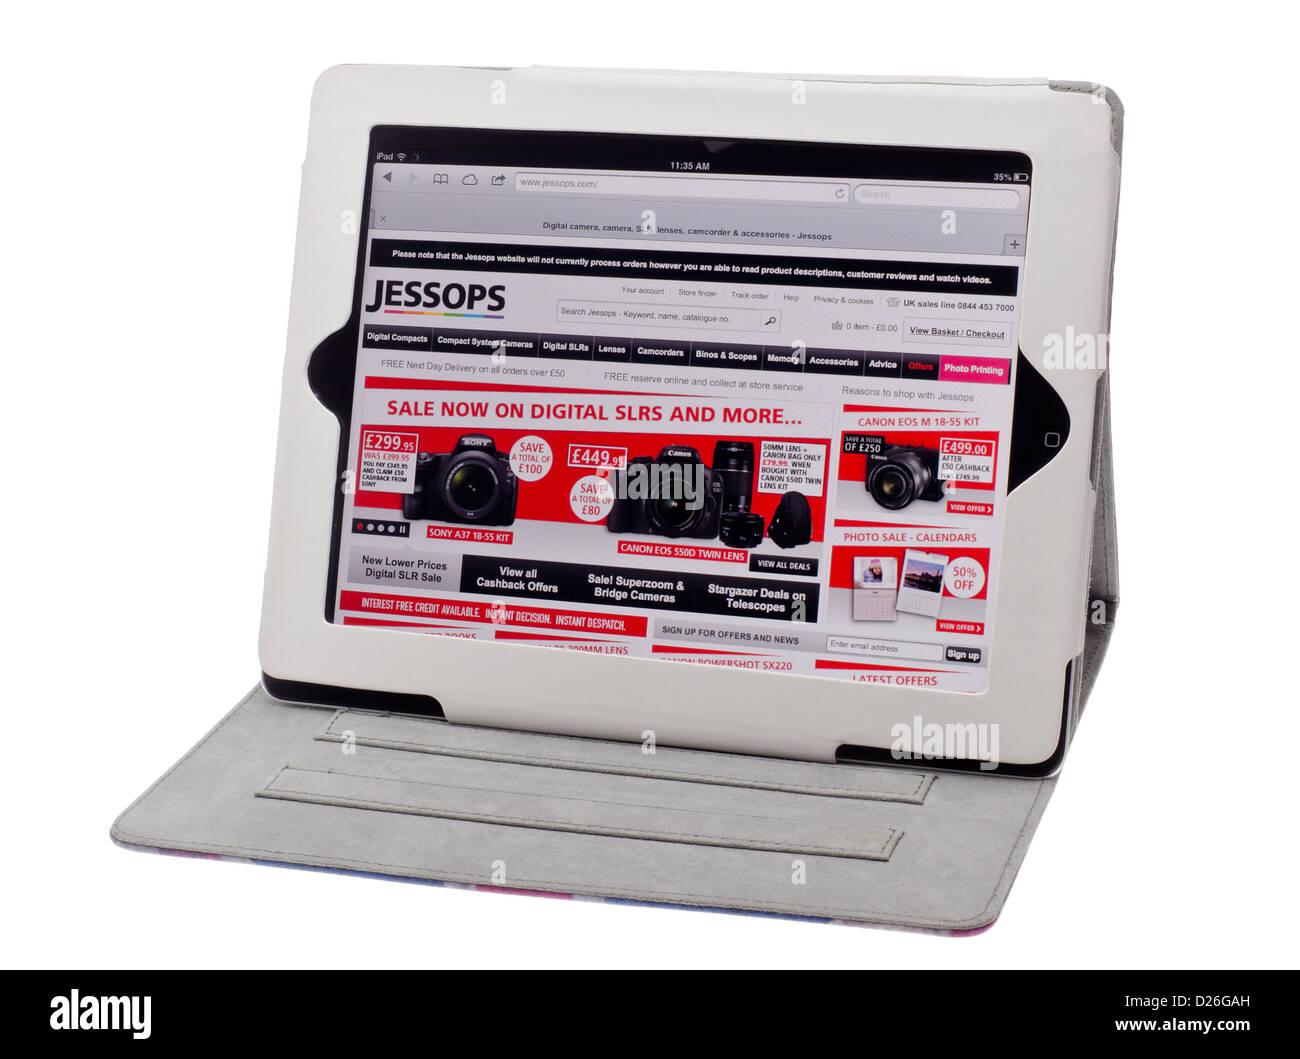 Apple Ipad showing Jessops Photography Website - Jan 2013. - Stock Image